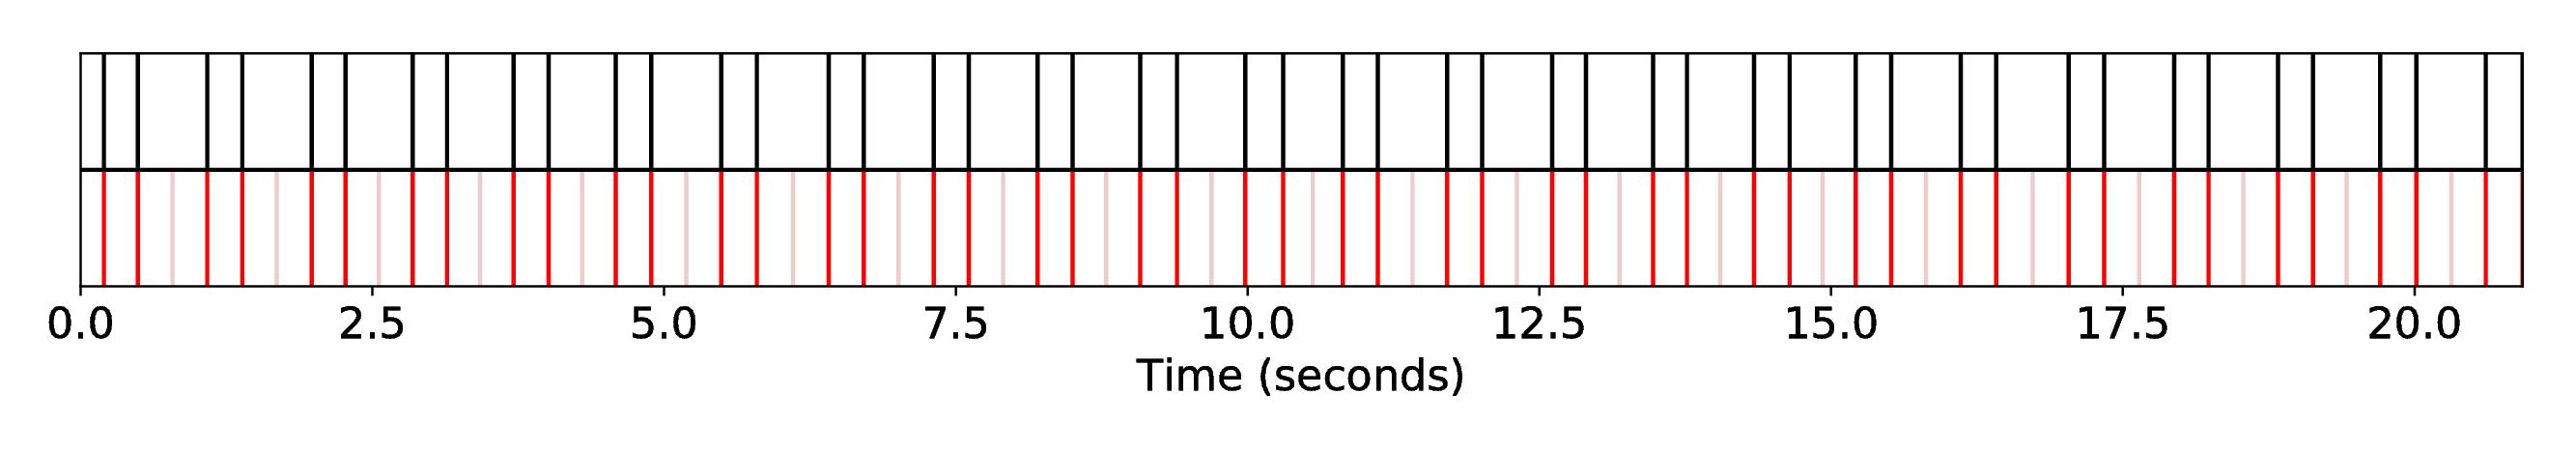 DP1_INT1_R-RW-Heart__S-Broke__SequenceAlignment